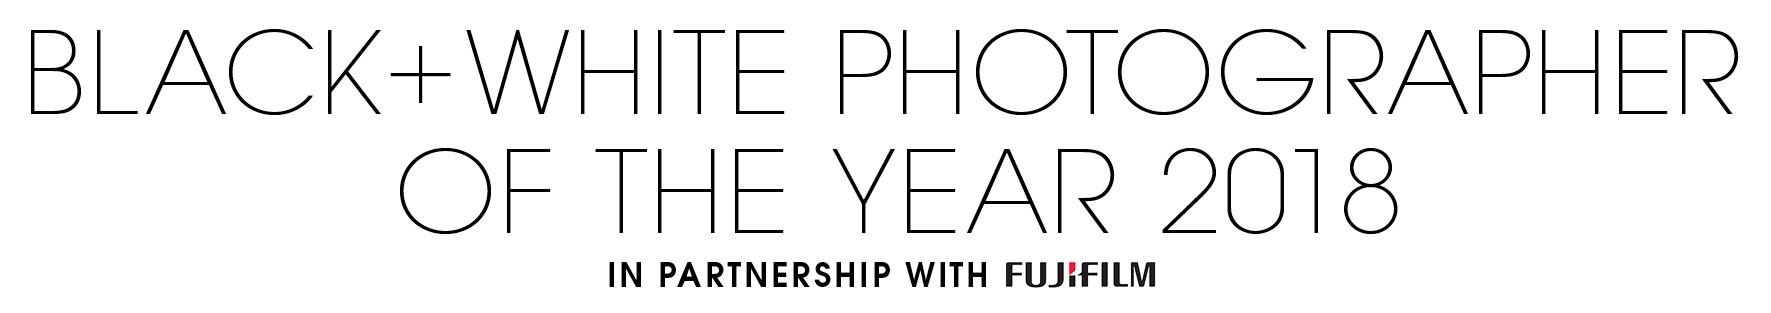 Black+White Photographer of the Year 2018 - logo